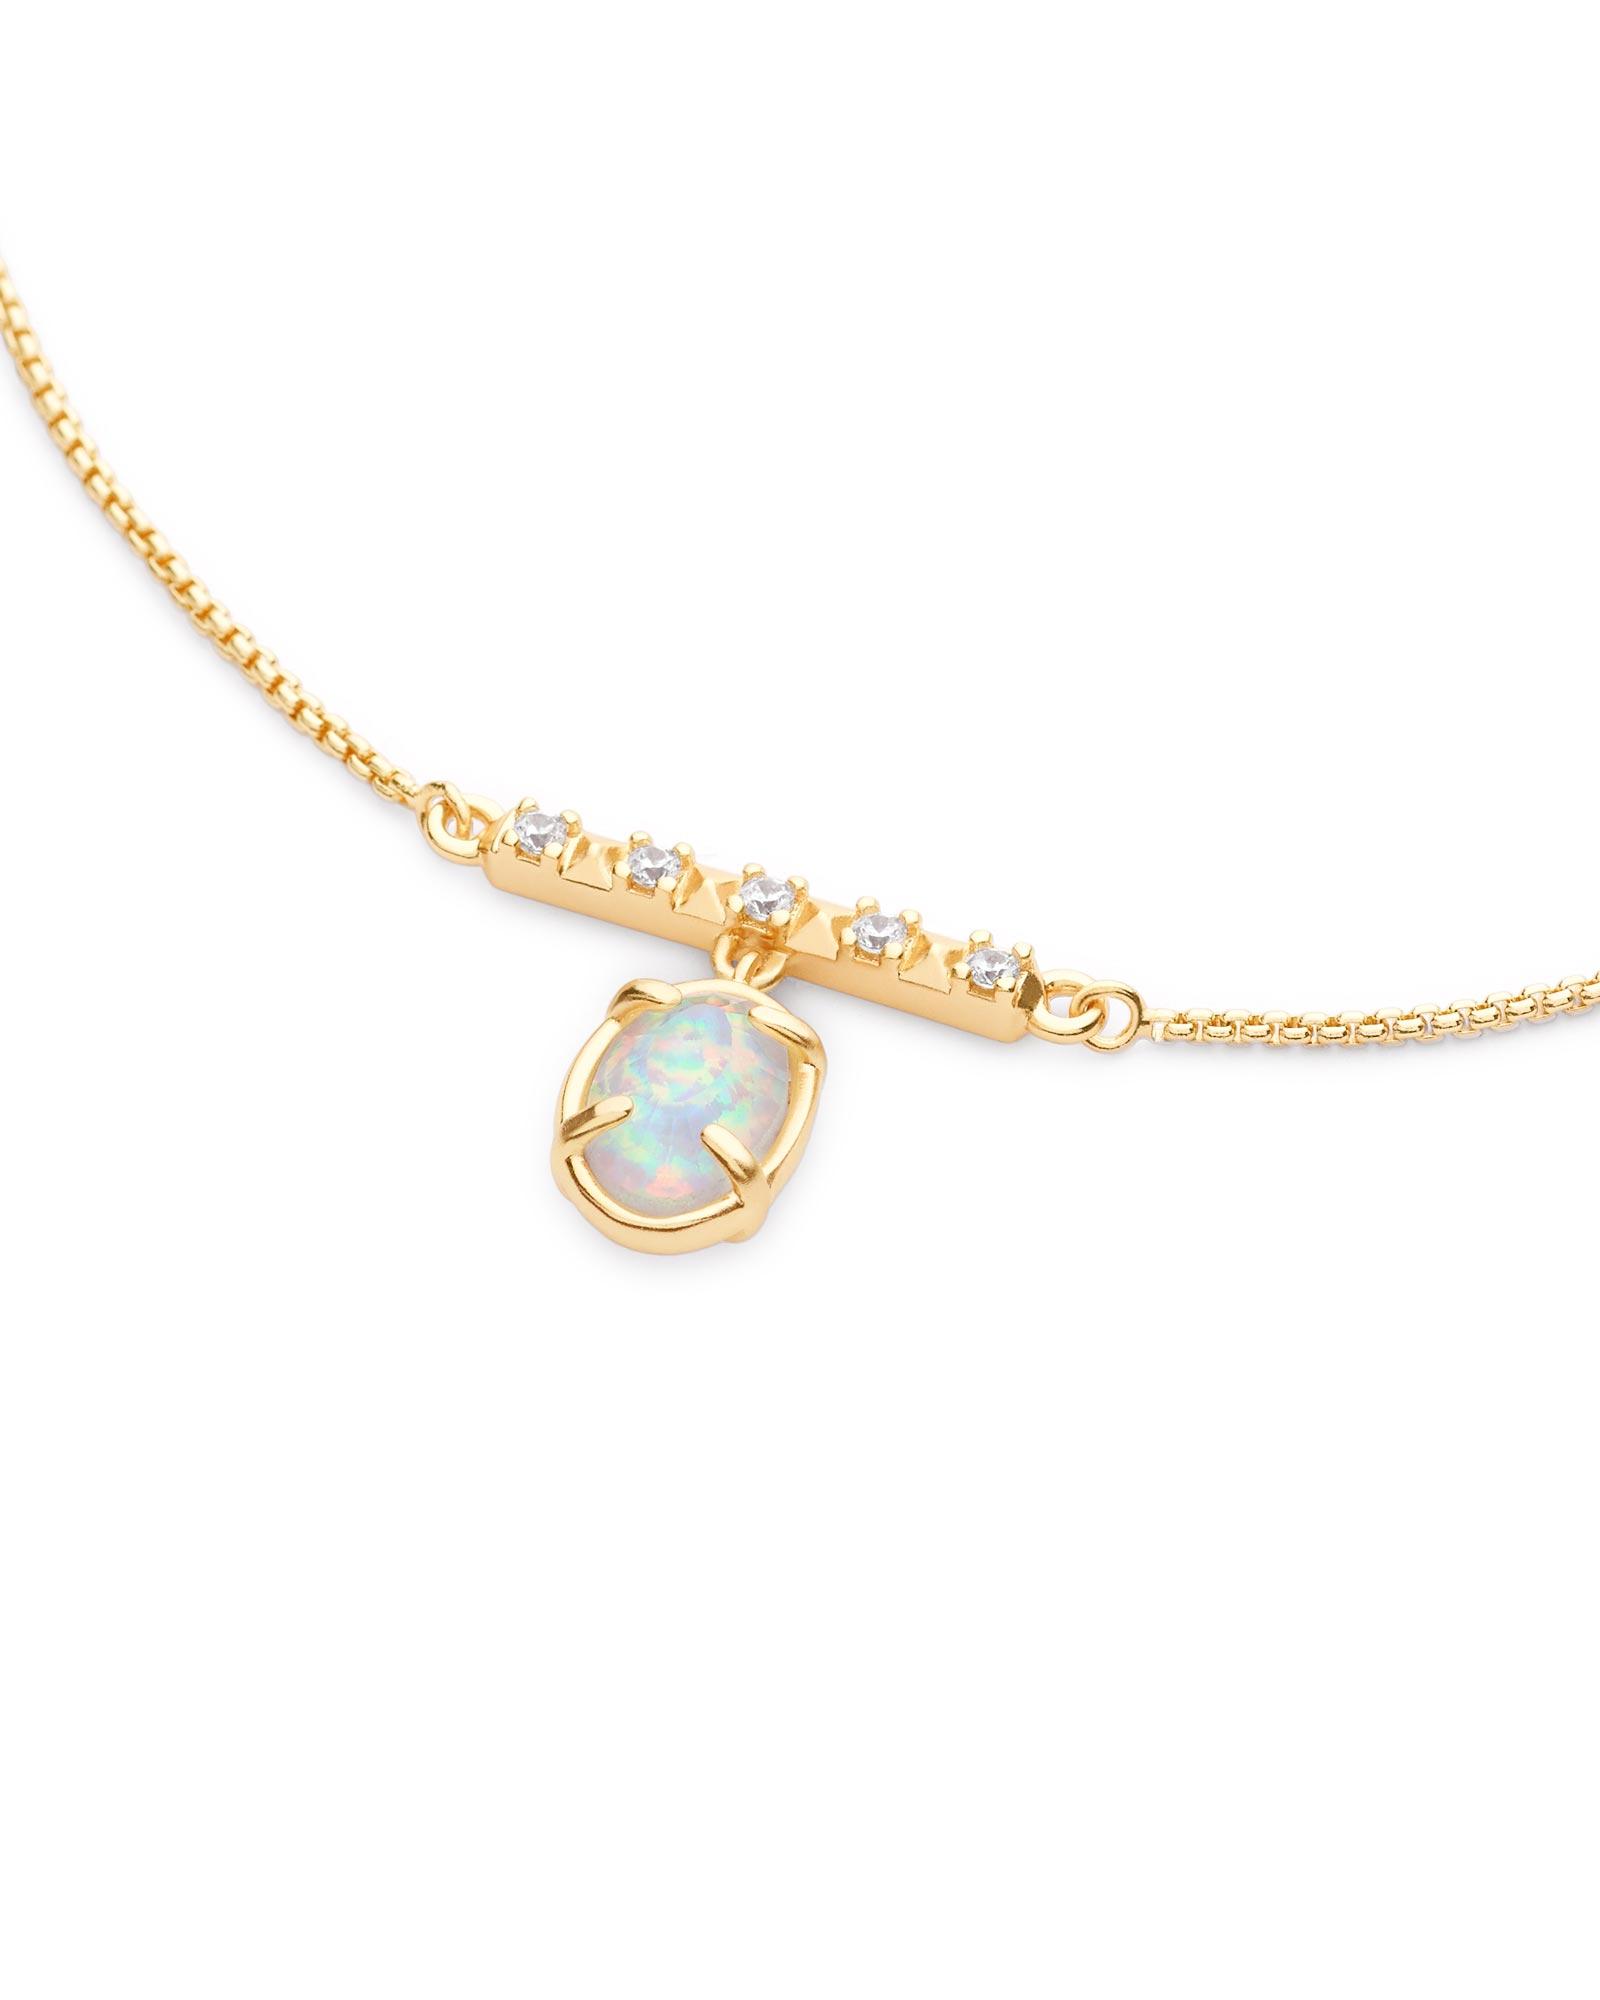 Fischer Pendant Necklace in Gold | Kendra Scott Jewelry